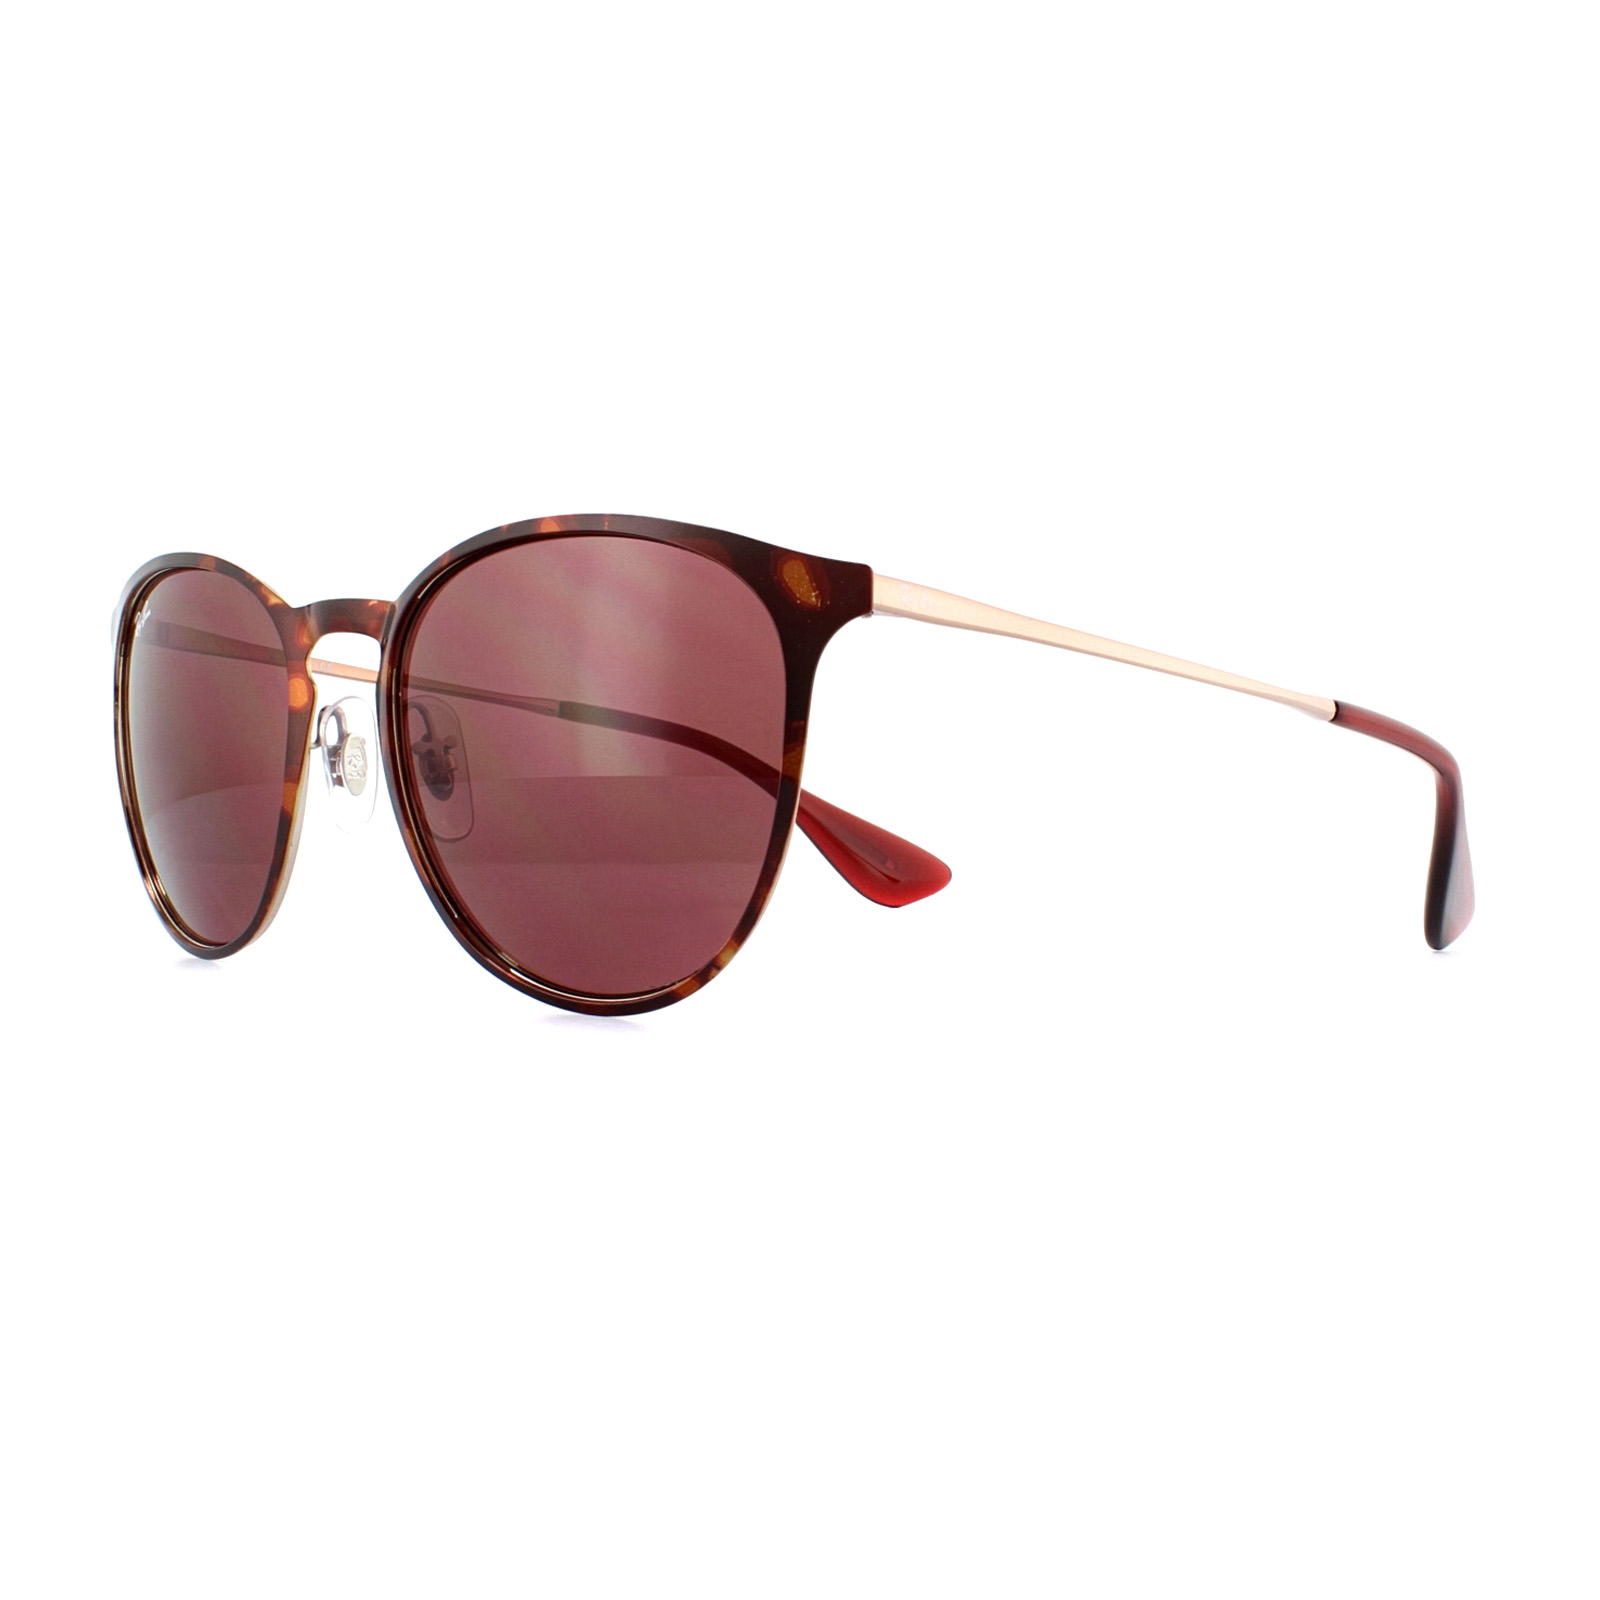 8ad6a3186c6 Sentinel Ray-Ban Sunglasses Erika Metal 3539 913375 Havana Dark Violet